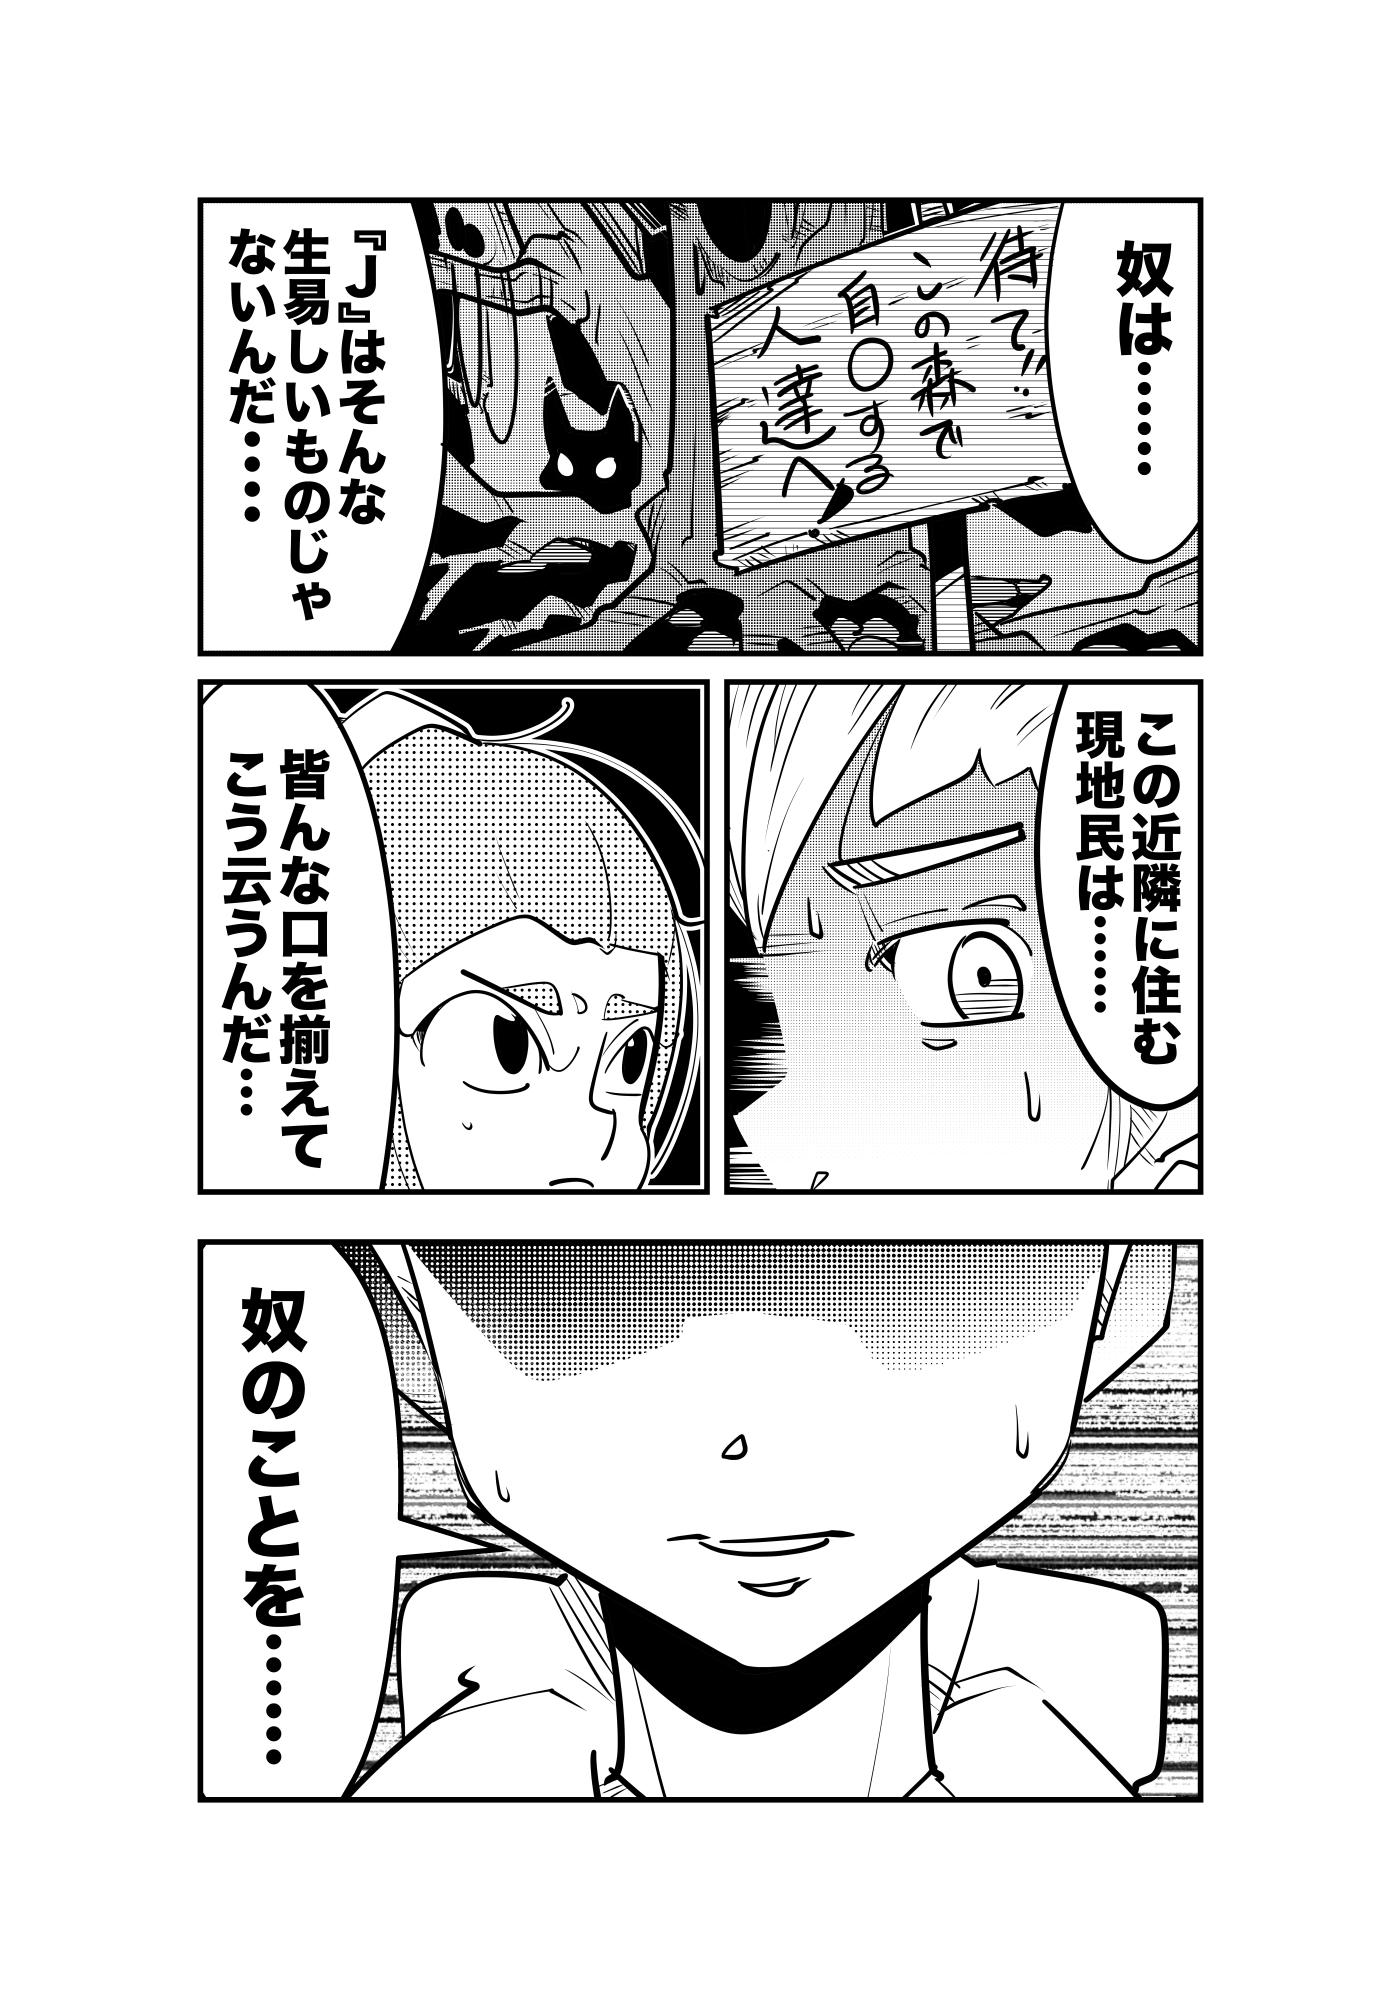 f:id:terashimaru117:20210914225712p:plain